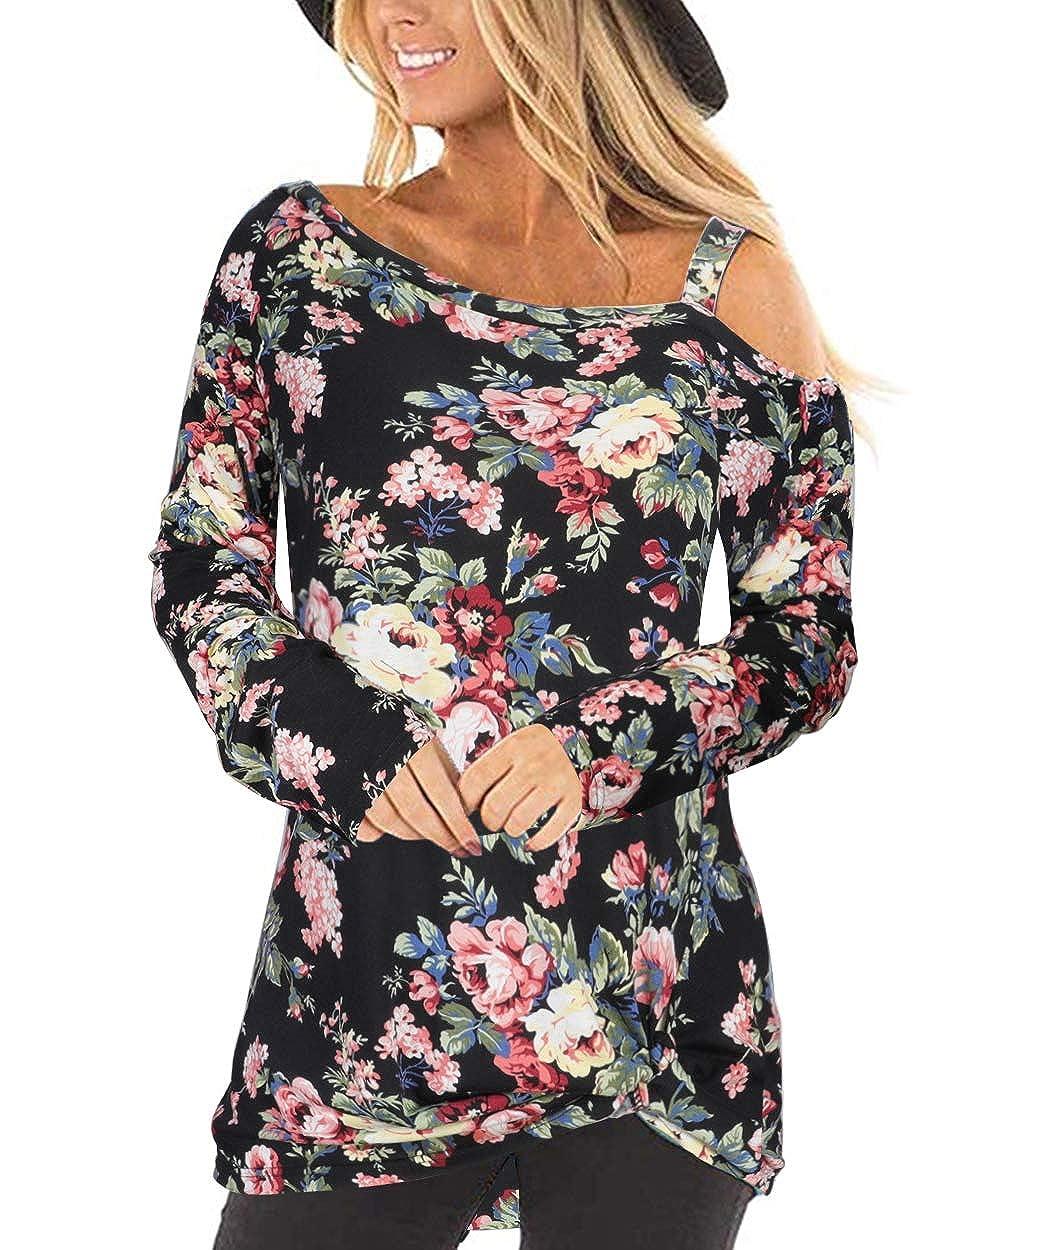 AUU Cold Shoulder T-Shirt Women Long Sleeve//Short Sleeve Shirt Casual Front Knot Side Twist Tunic Tops